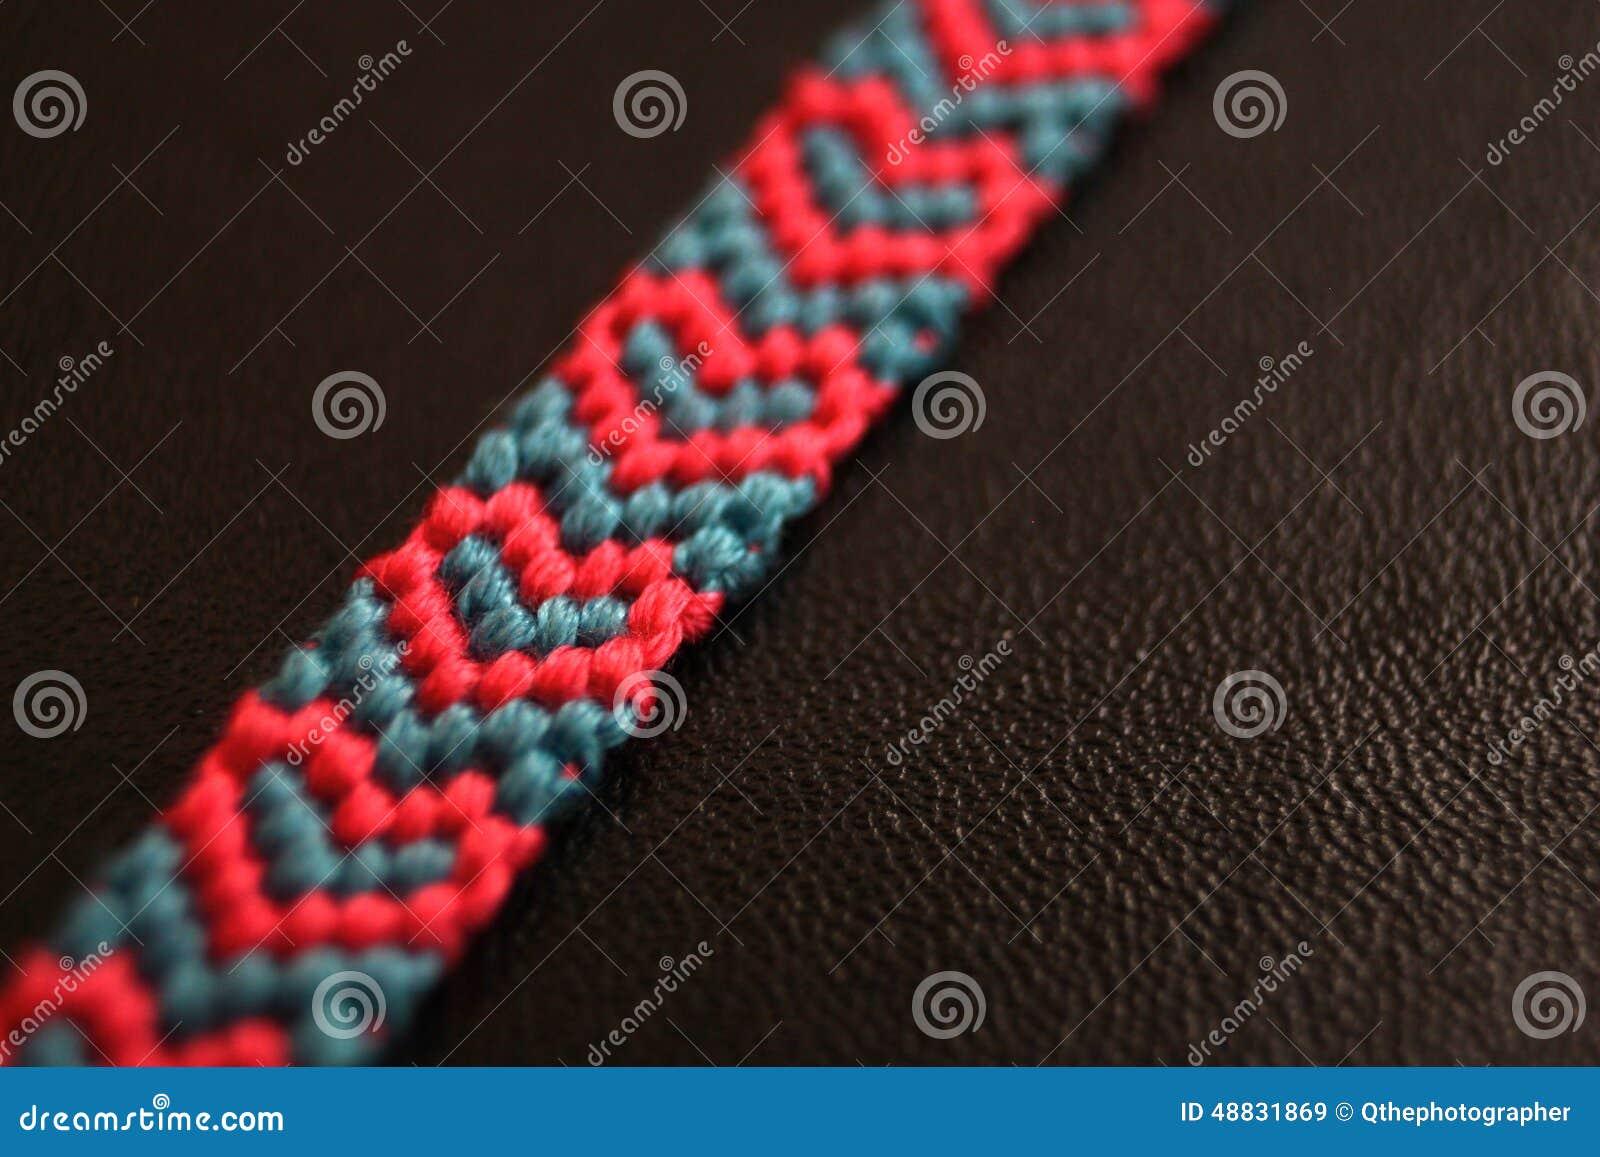 Blue Bracelet Friendship Heart